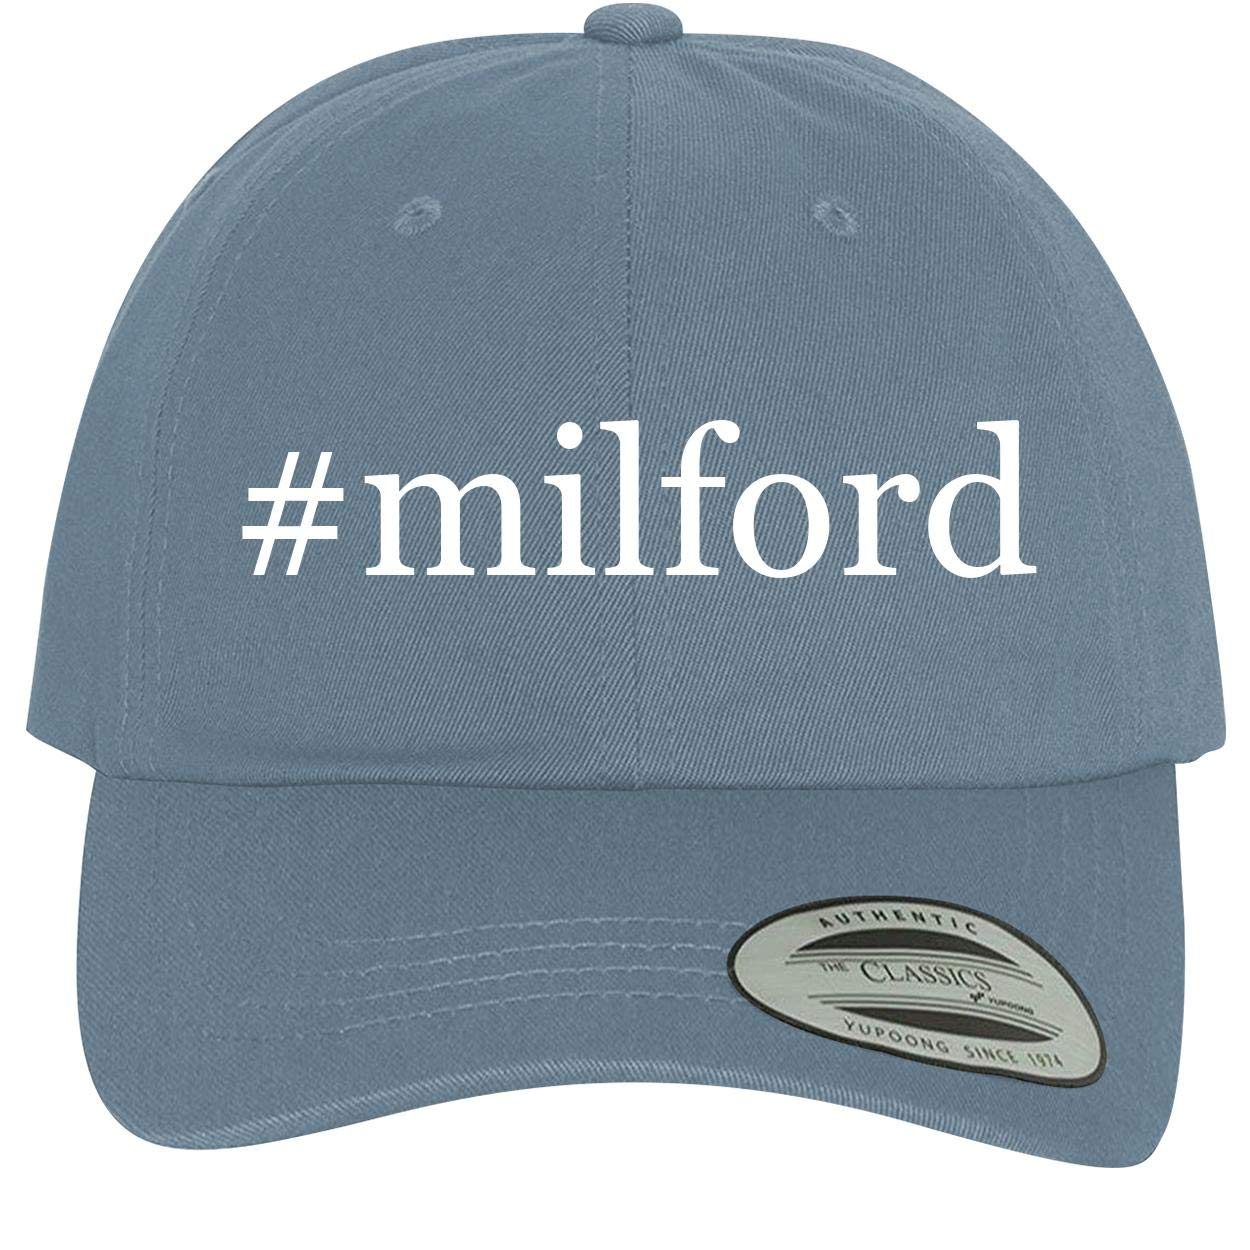 Comfortable Dad Hat Baseball Cap BH Cool Designs #Milford